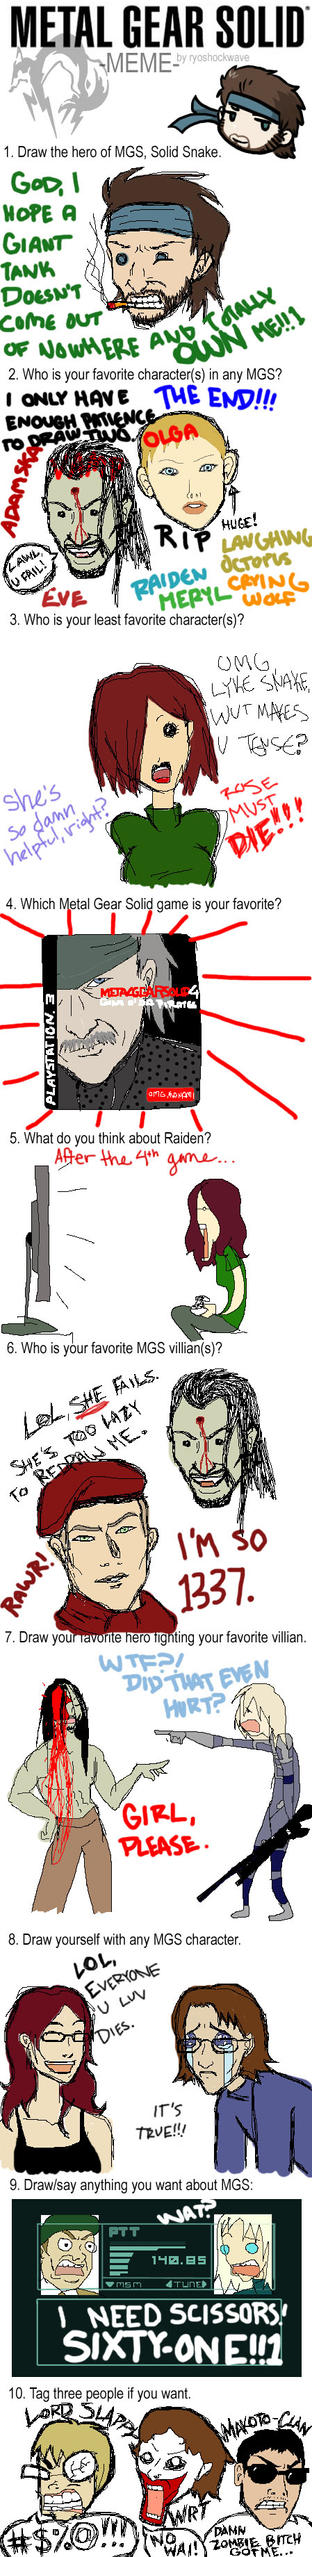 MGS Meme by DeficientAtLife